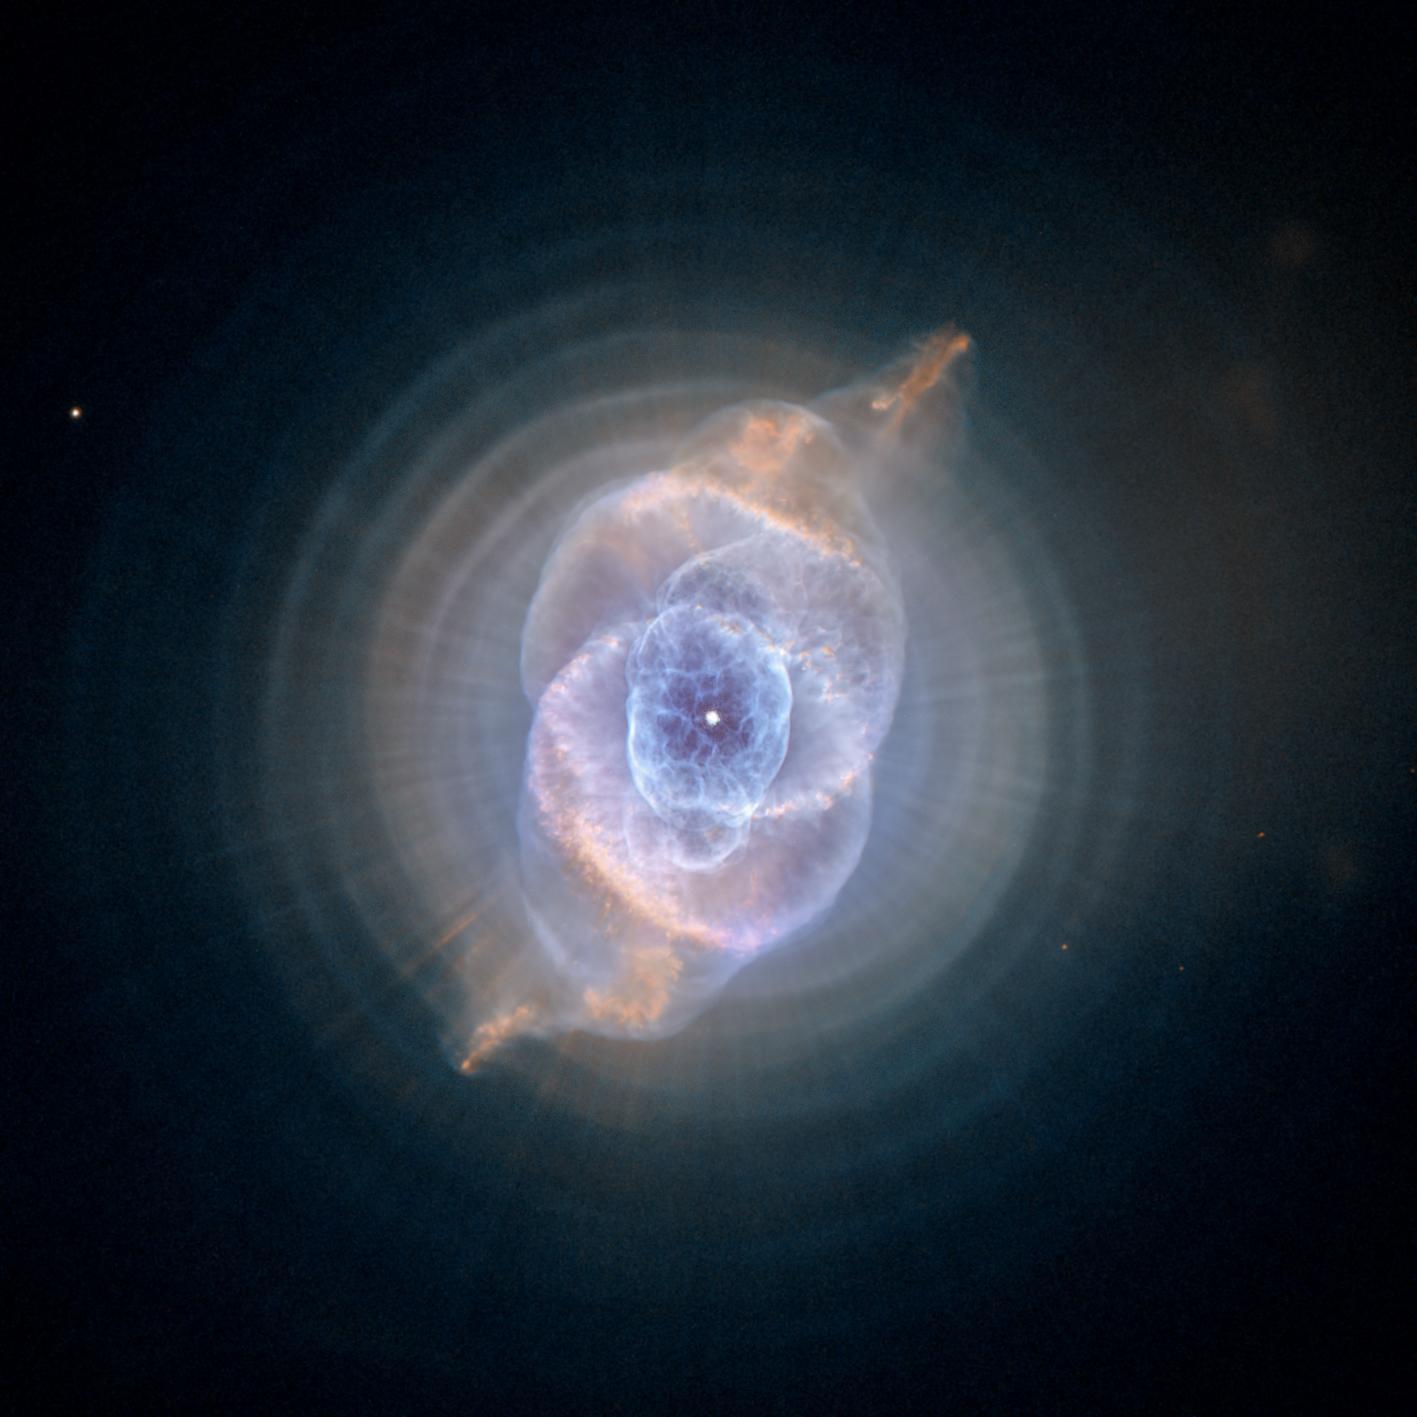 2014 November 9 - The Cat's Eye Nebula from Hubble